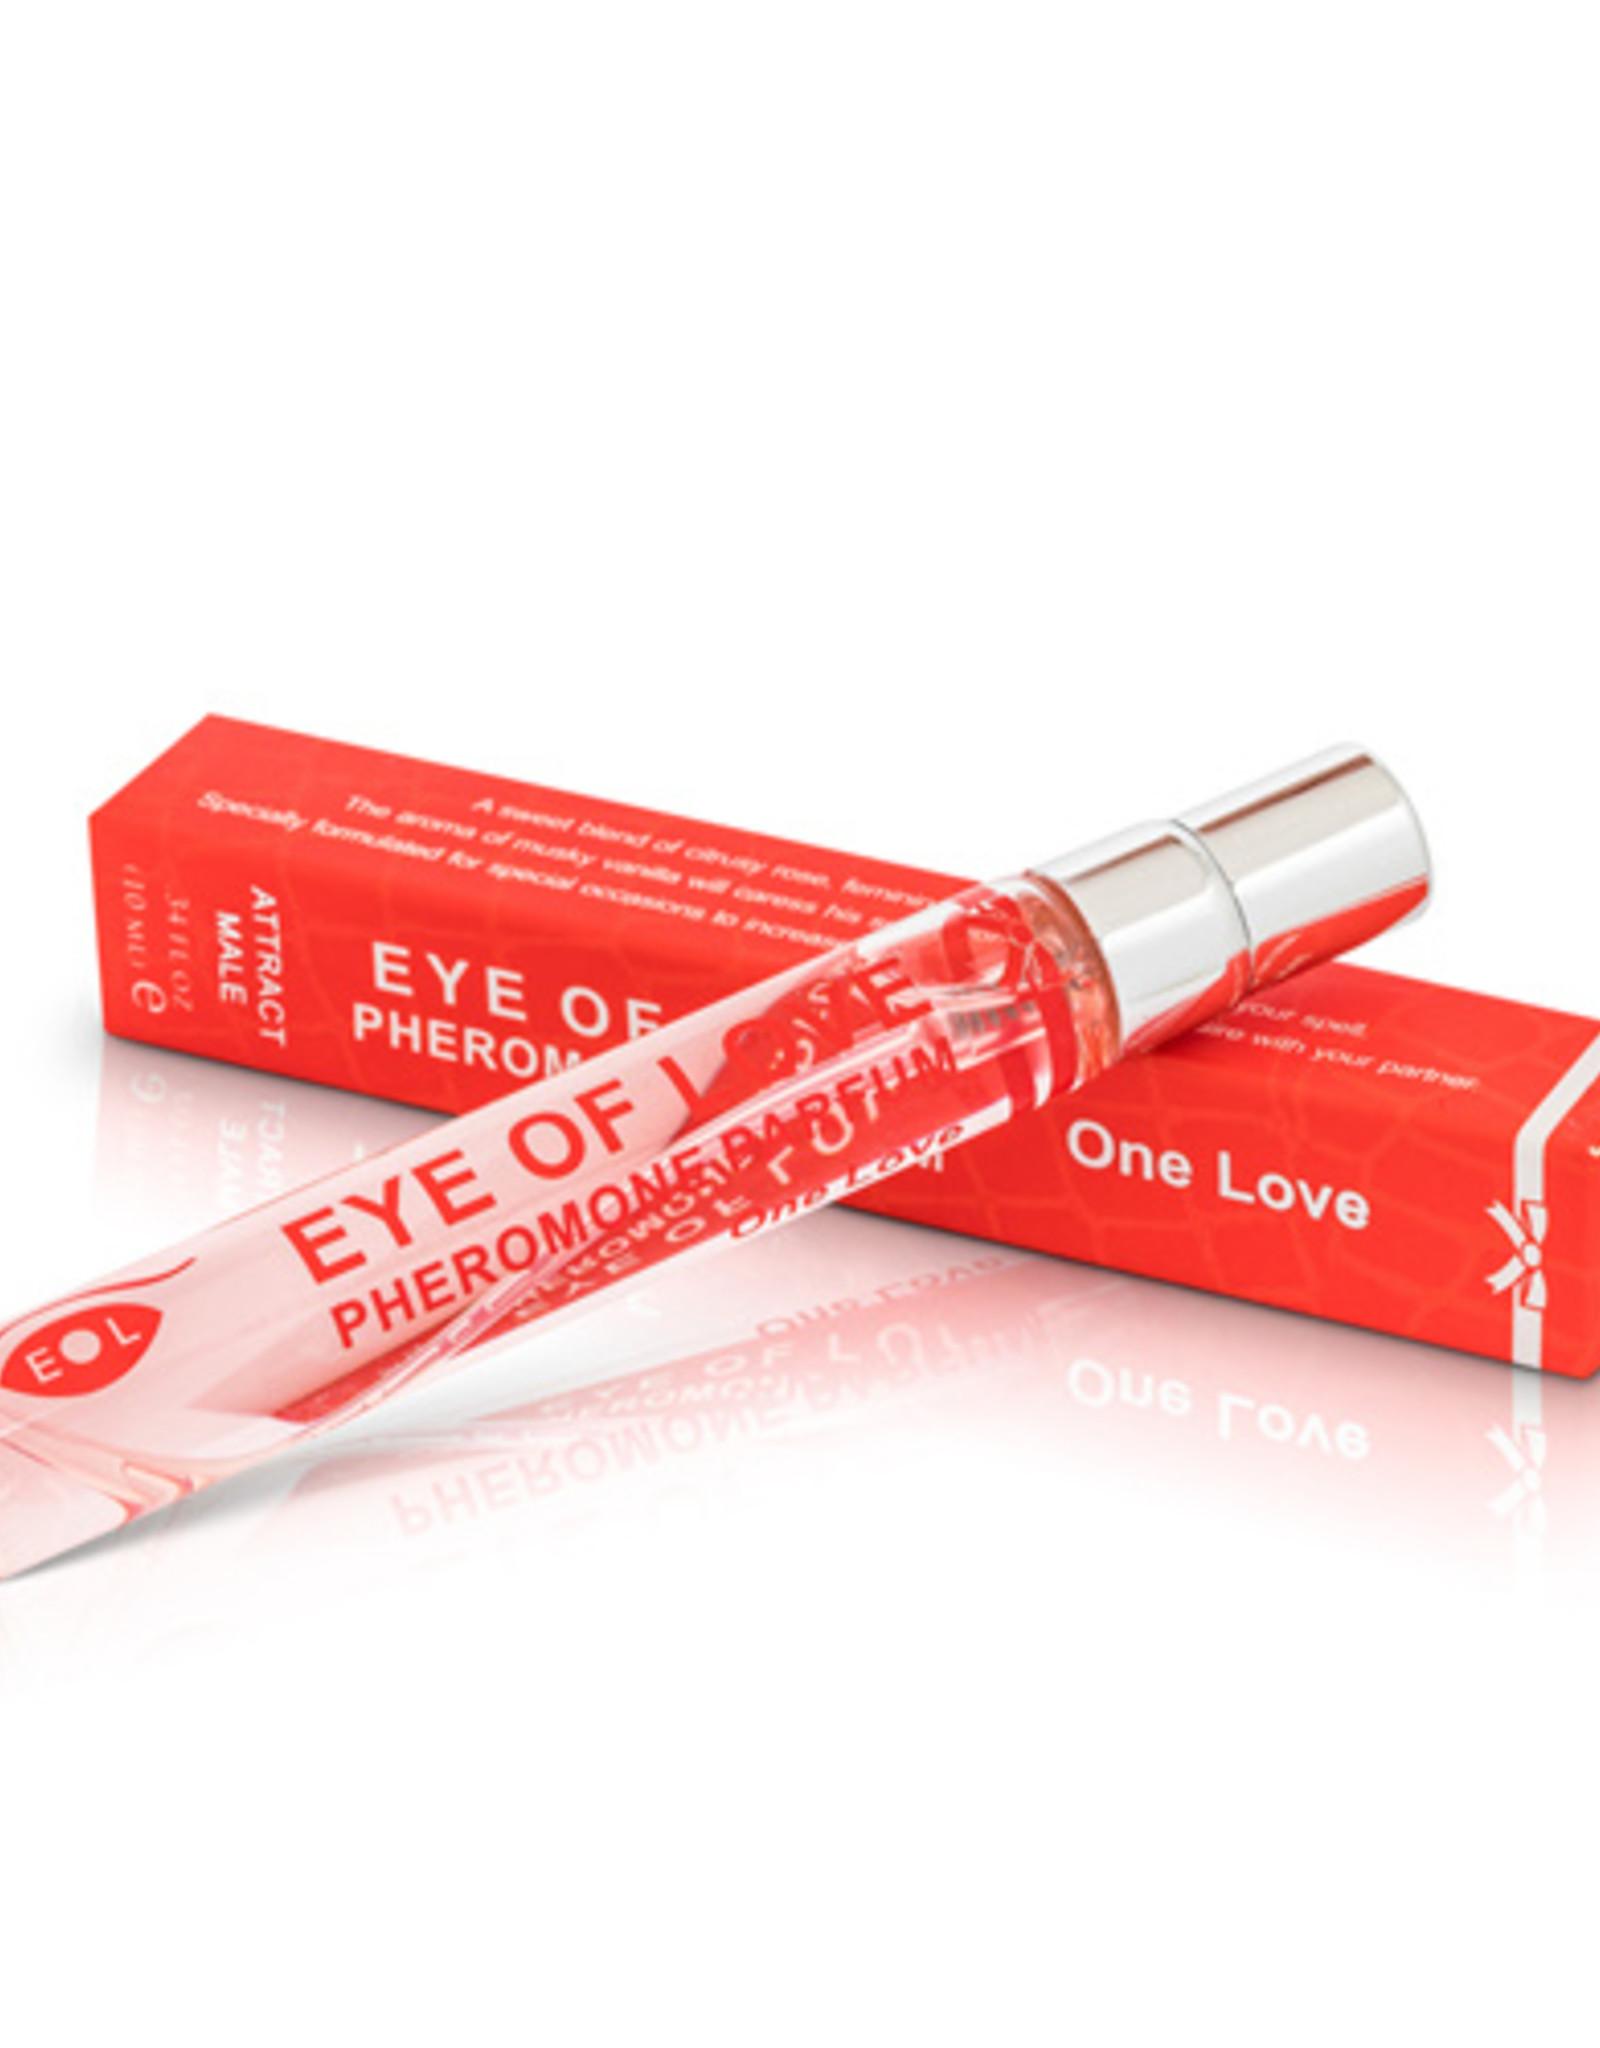 Eye Of Love Eye Of Love Bodyspray 10 ml Vrouw Tot Man - ONE LOVE